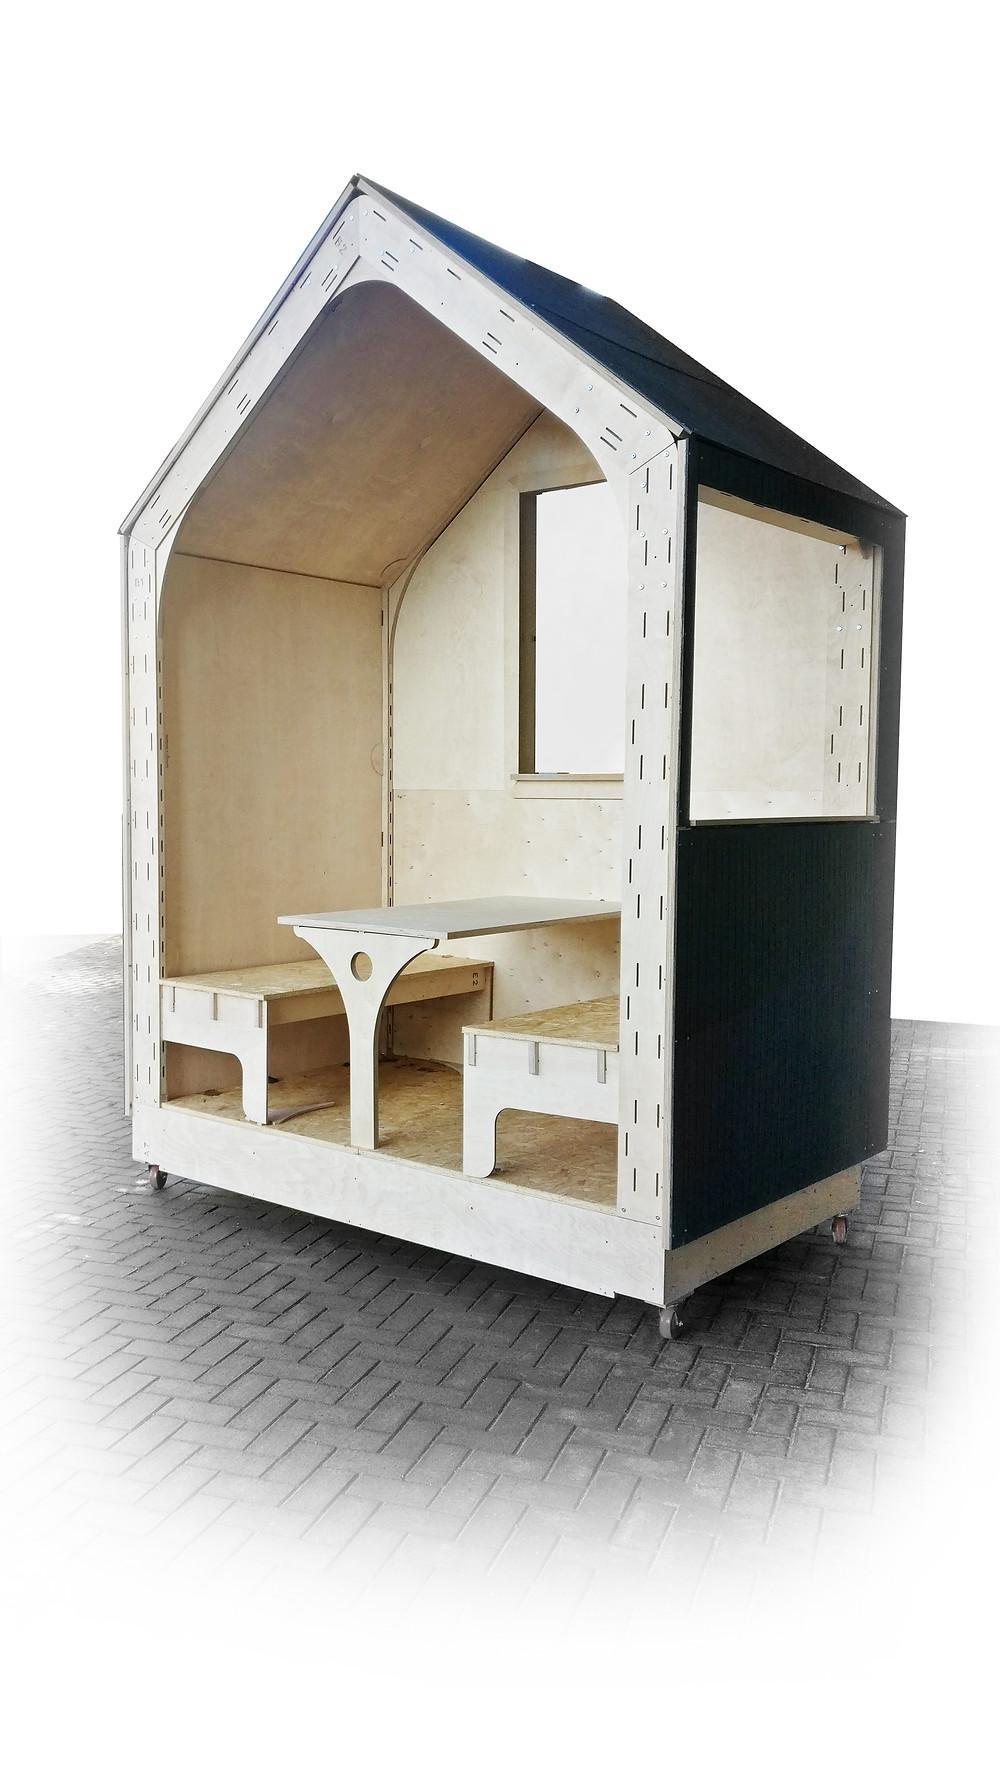 Digitally fabricated tiny home prototype